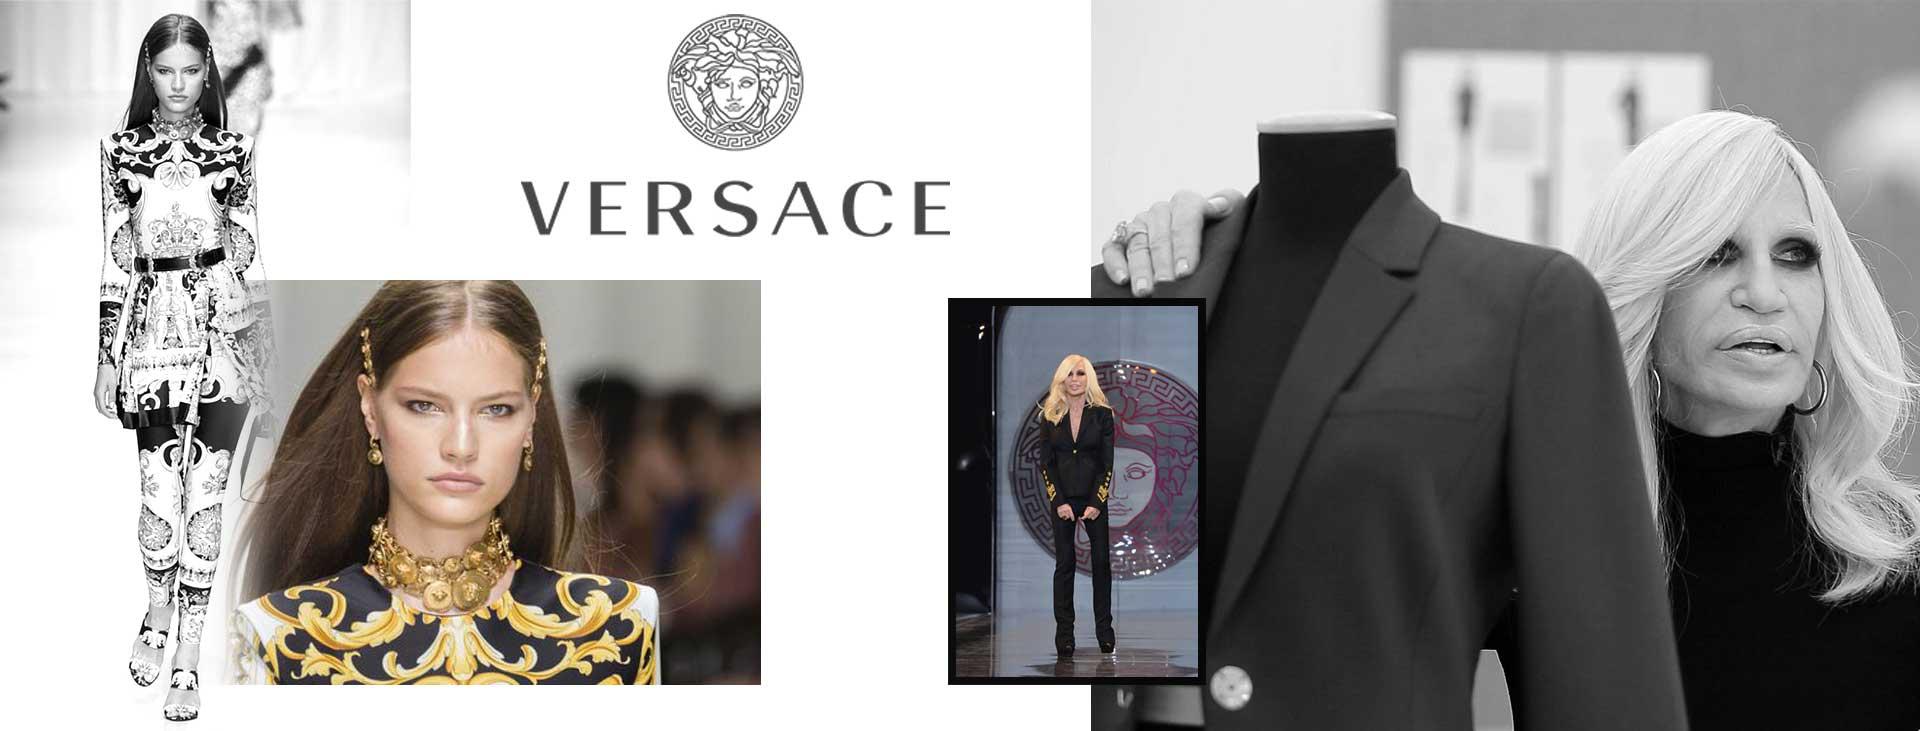 versace2 - زنان پیشگام در صنعت مد